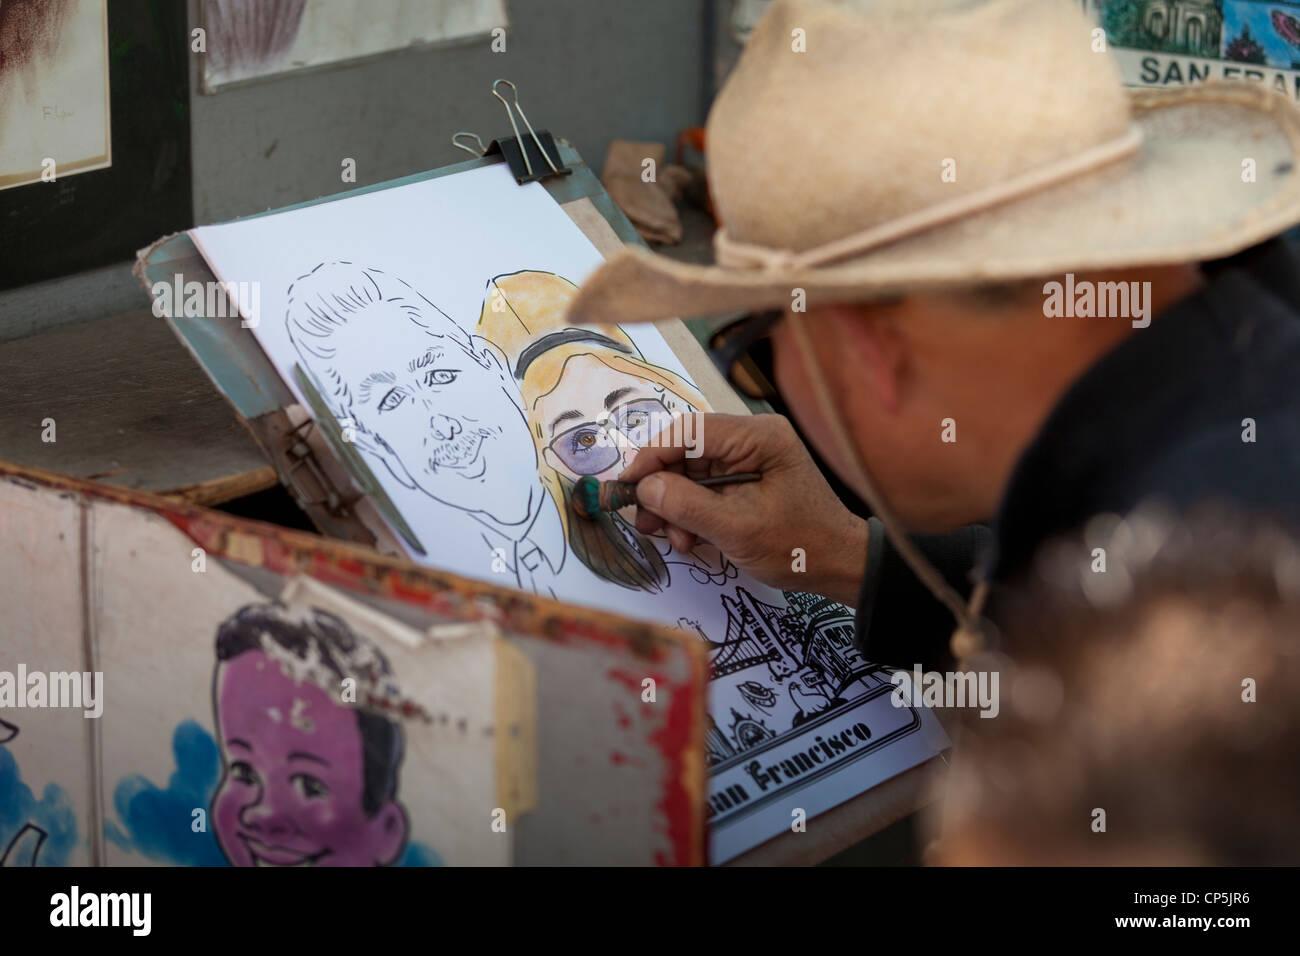 Street caricature artist drawing a couple portrait - San Francisco, California USA - Stock Image